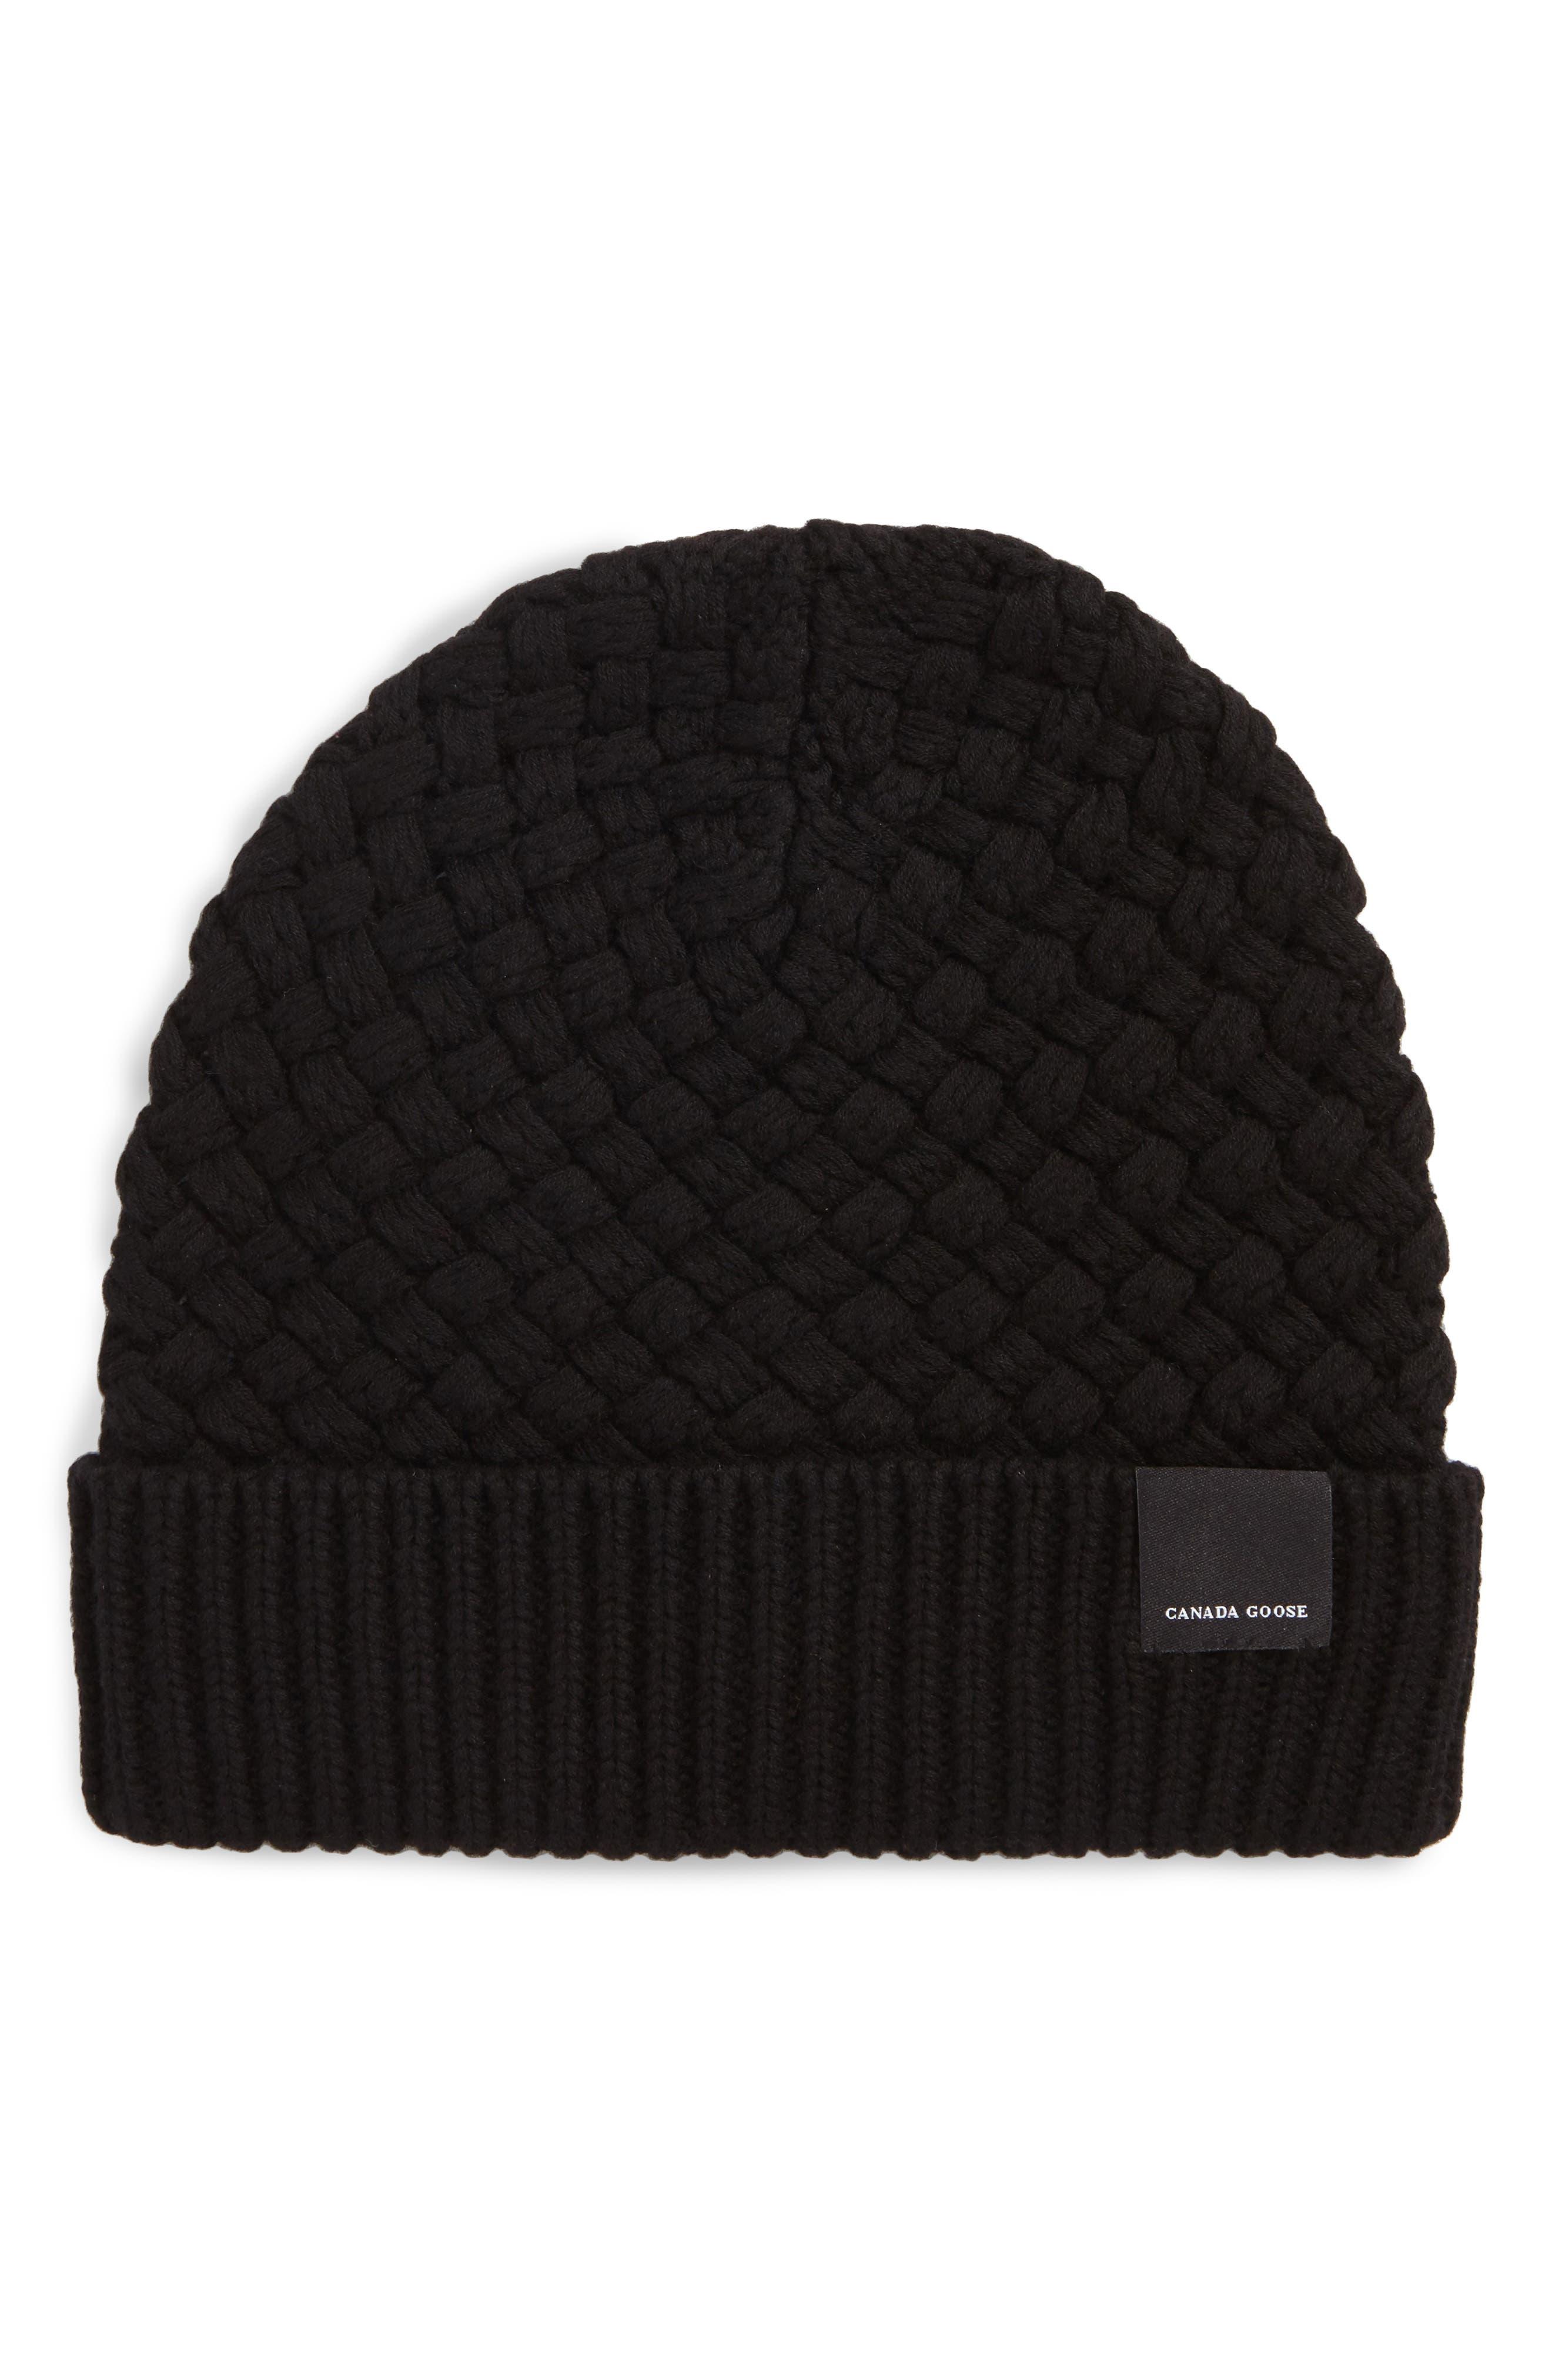 Merino Wool Basket Stitch Beanie,                             Main thumbnail 1, color,                             Black